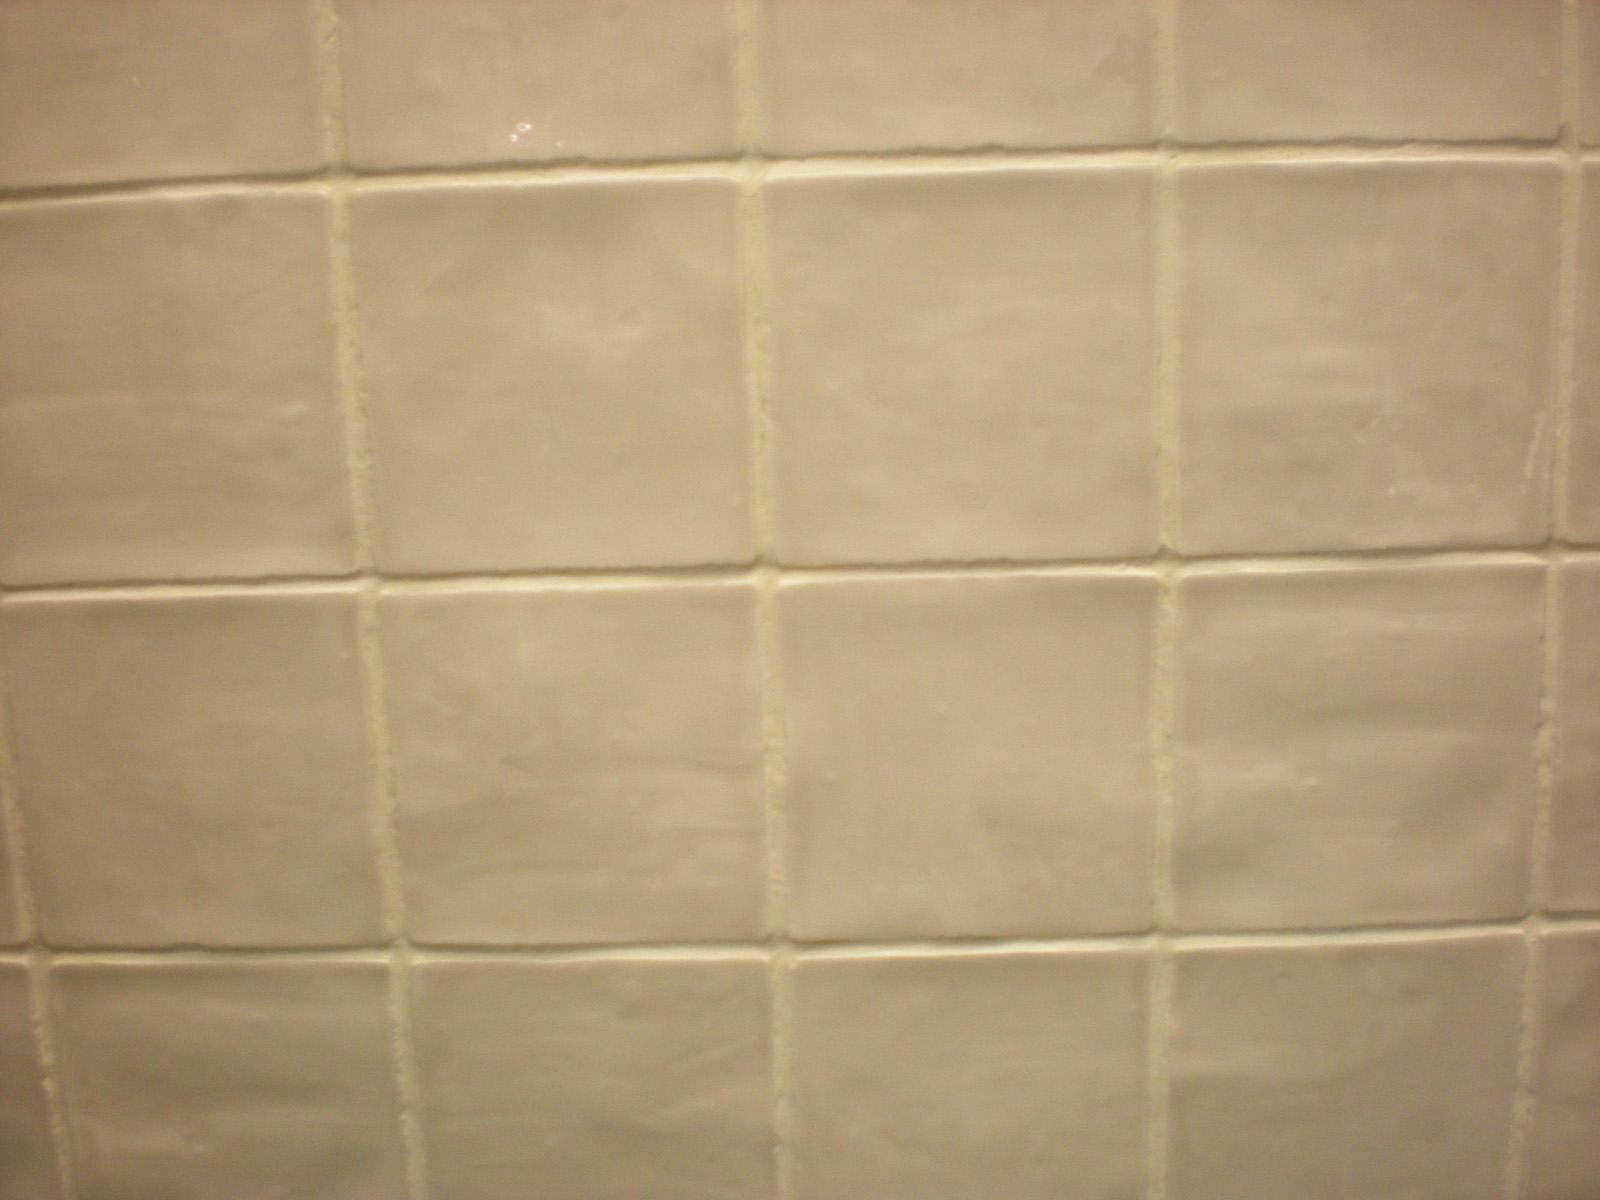 perfect bathroom tiles kendal samplekendalglazedceramicwalltilesdiykitchen bathroom tiles kendal d decor bathroom tiles kendal - Bathroom Tiles Kendal